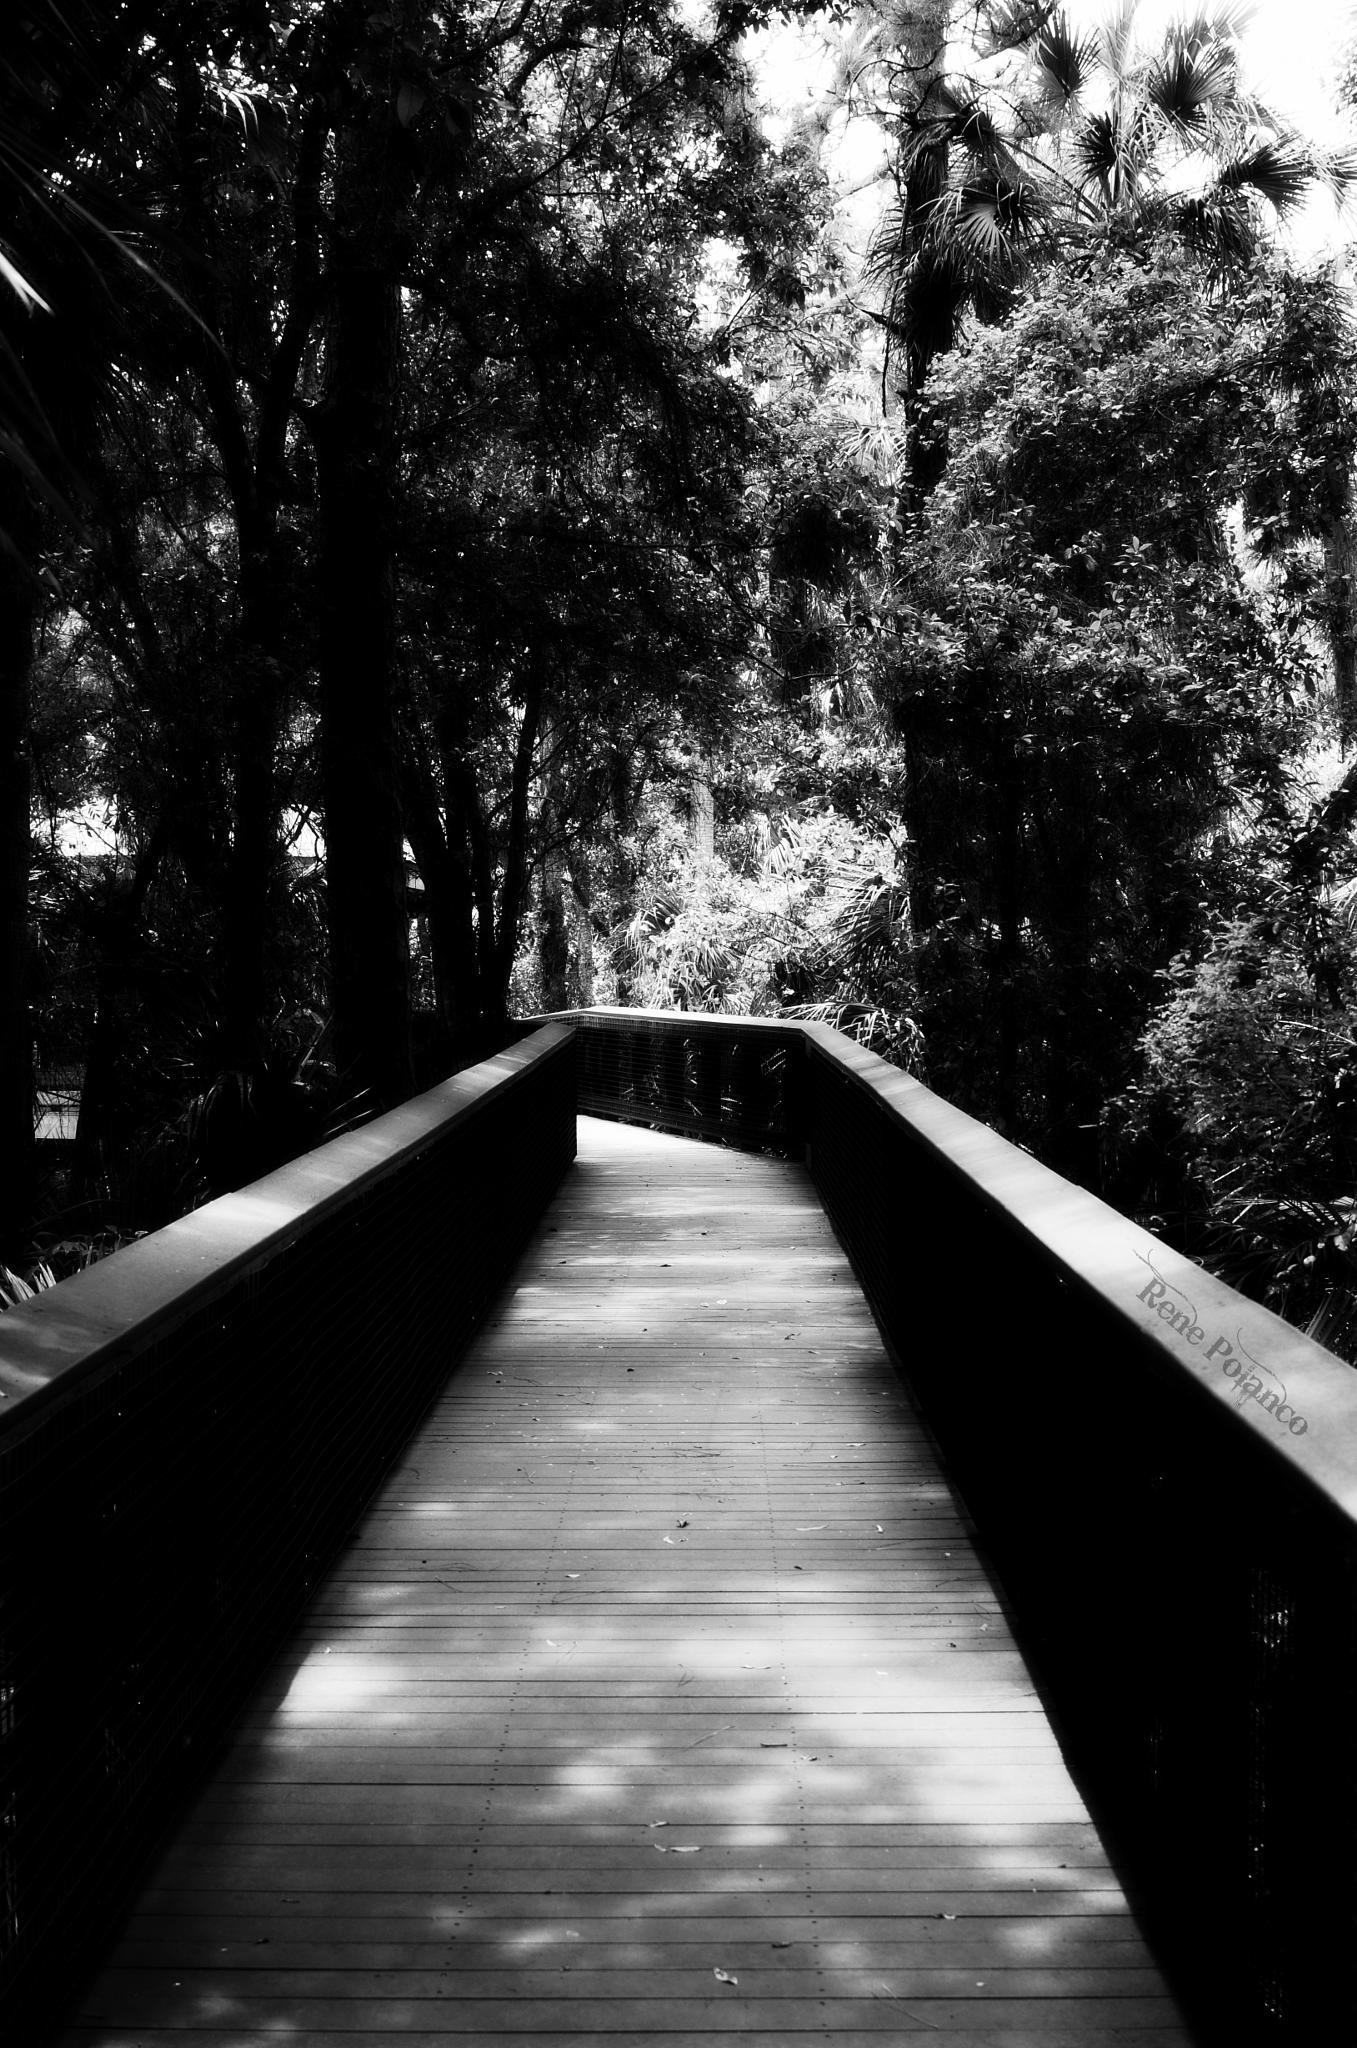 Path to One's Self by Rene Polanco